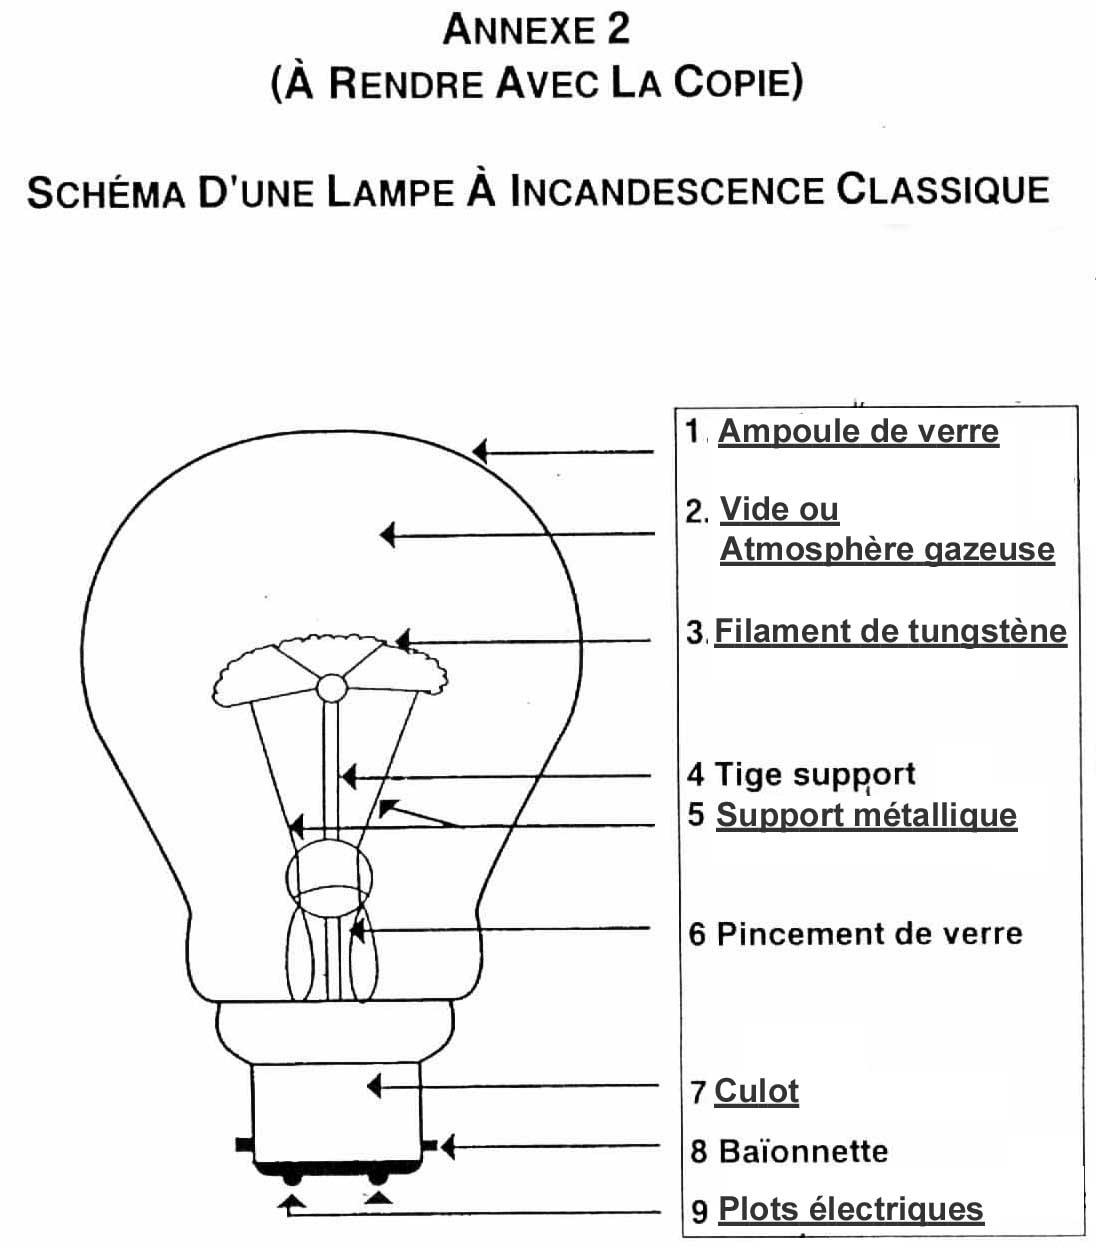 Sciences Appliquees A L Hotellerie